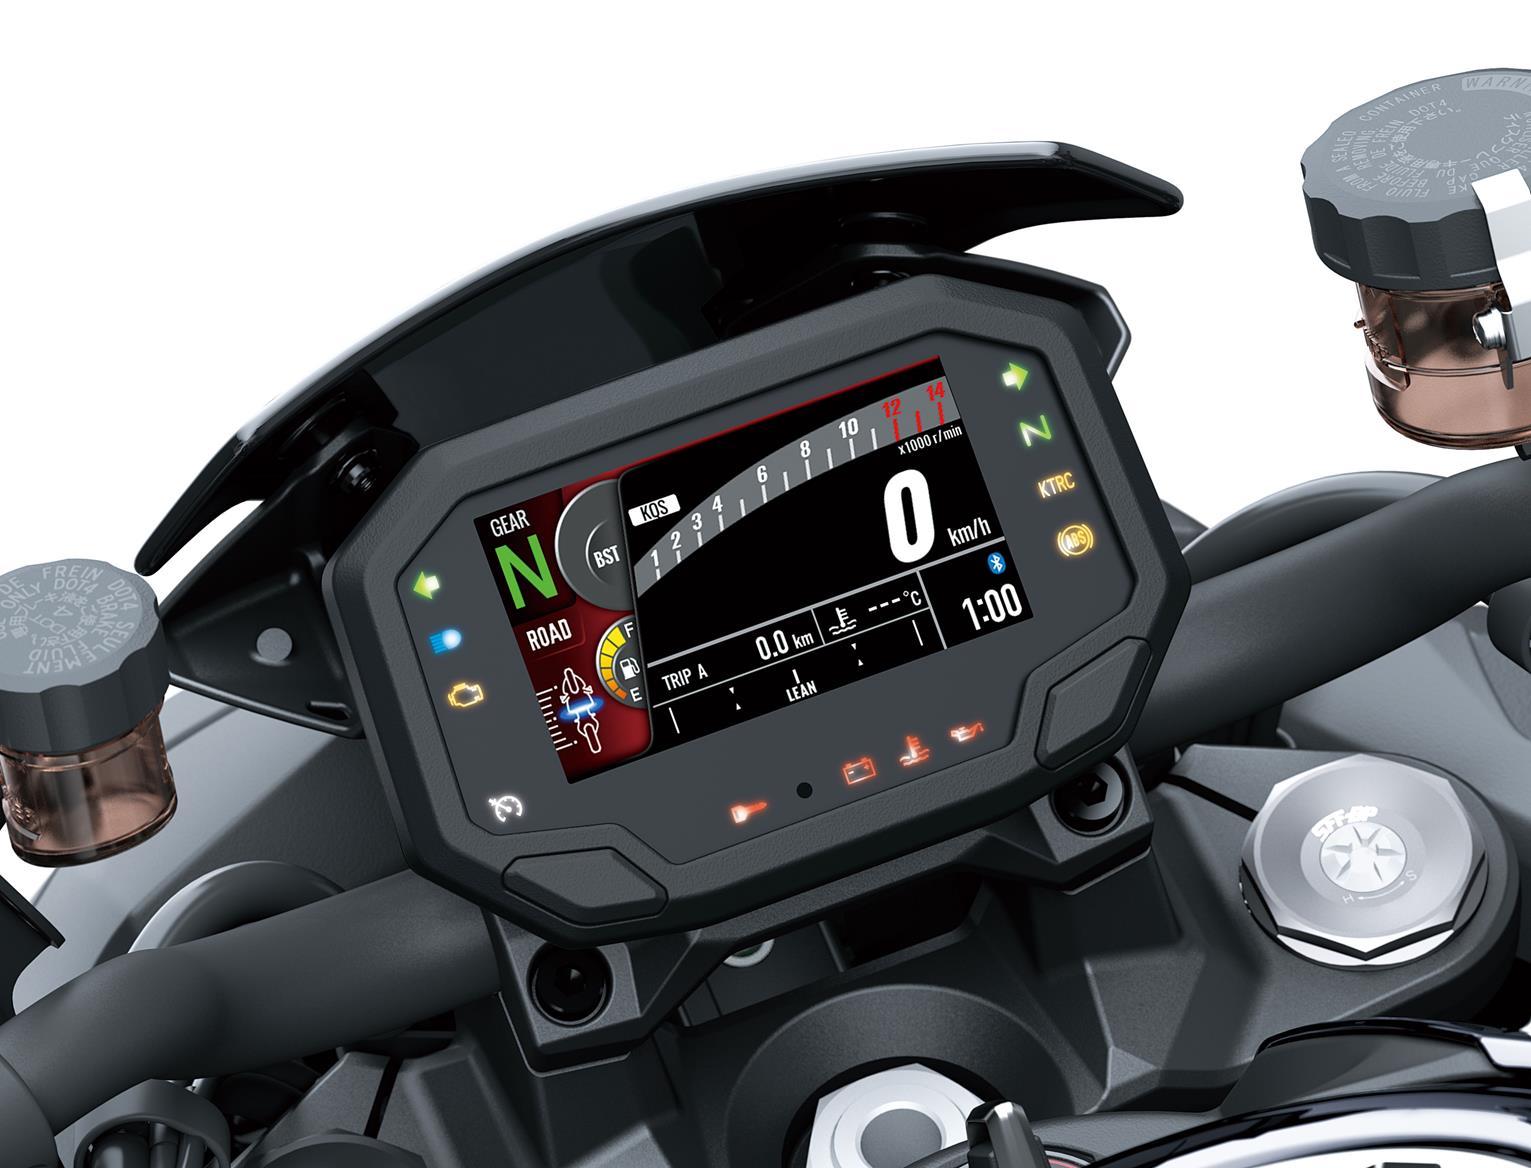 Kawasaki Z H2 TFT clocks